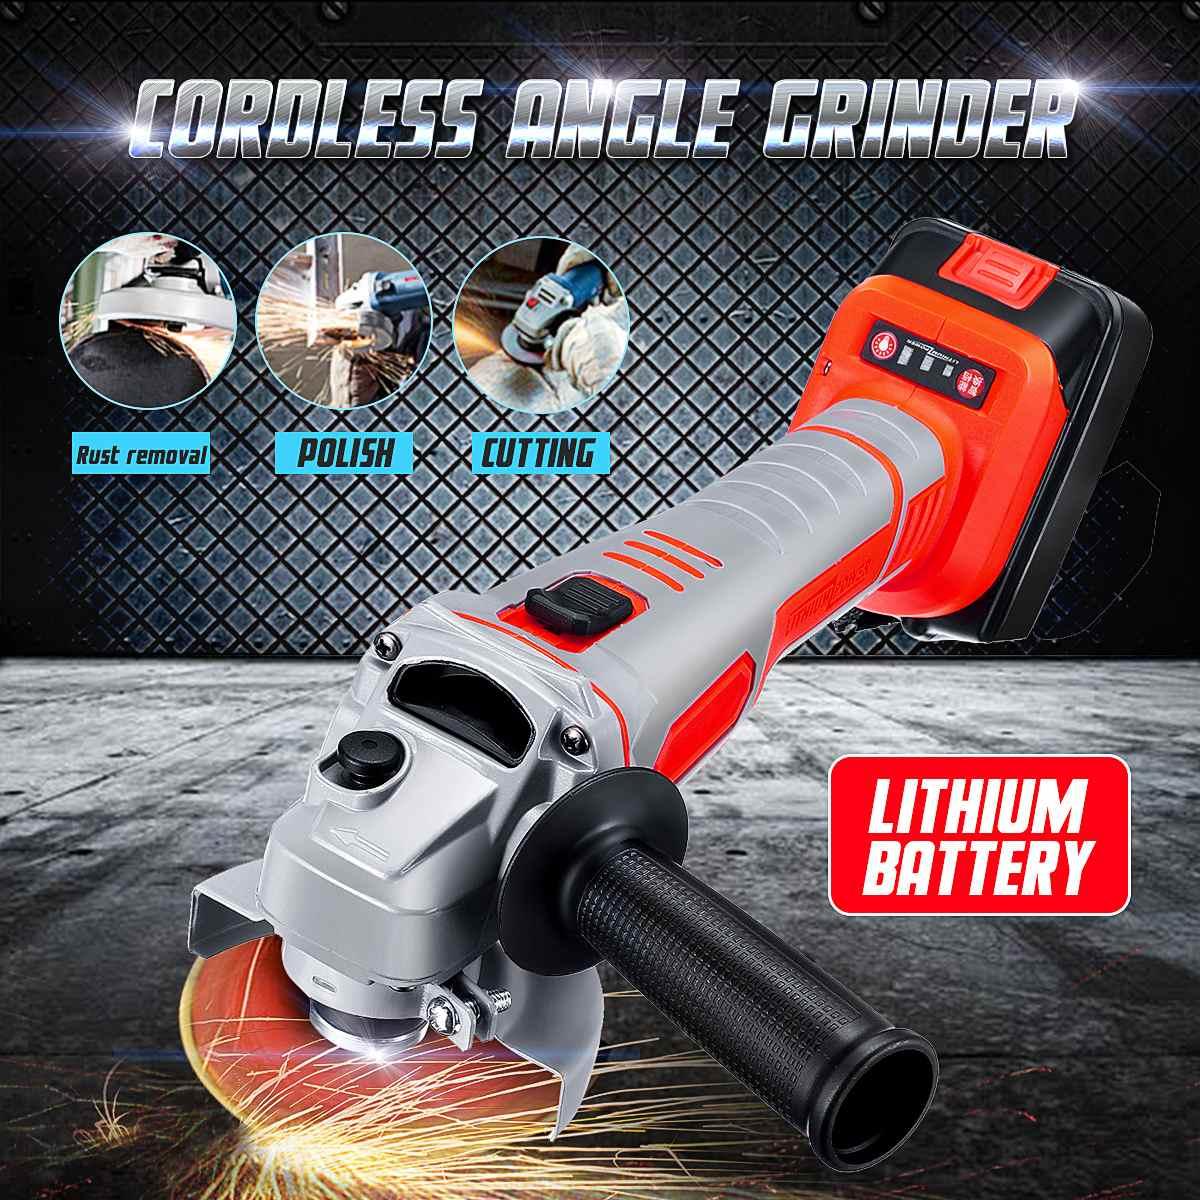 188/218VF Electric Angle Grinder Cordless 29800mah large capacity battery Polisher Polishing Machine Cutting Power Tool Set